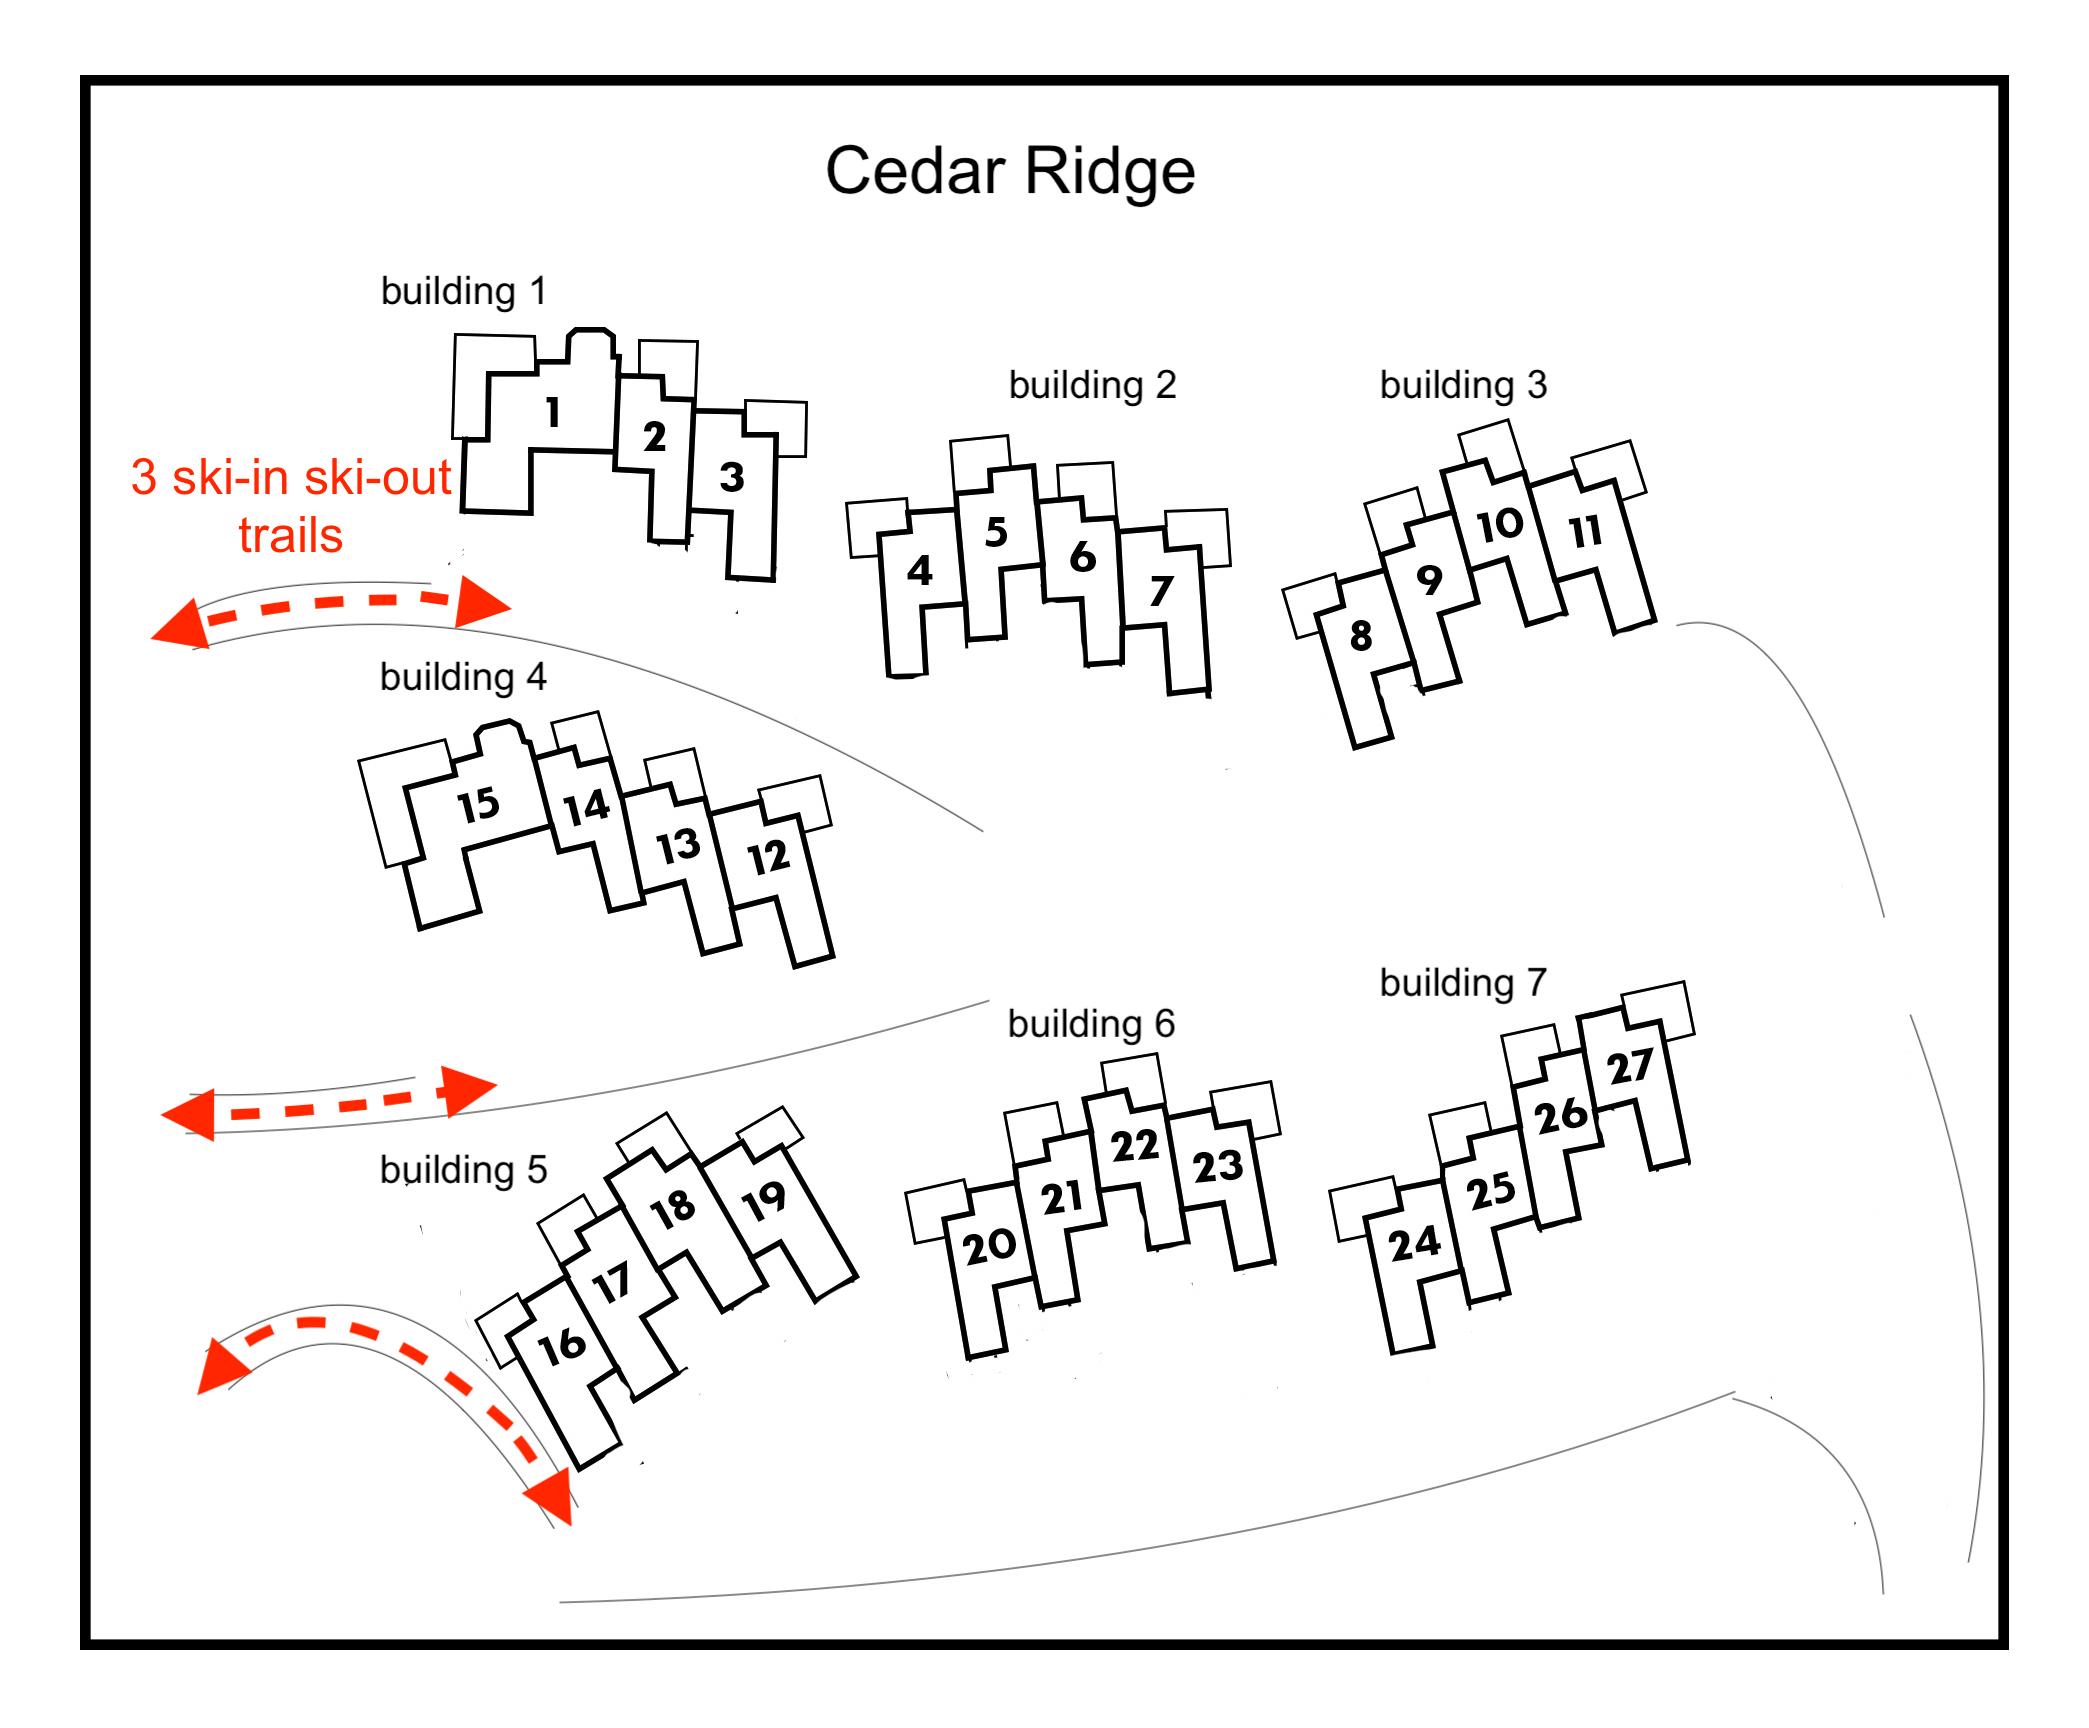 Cedar Ridge ski trails marked in red